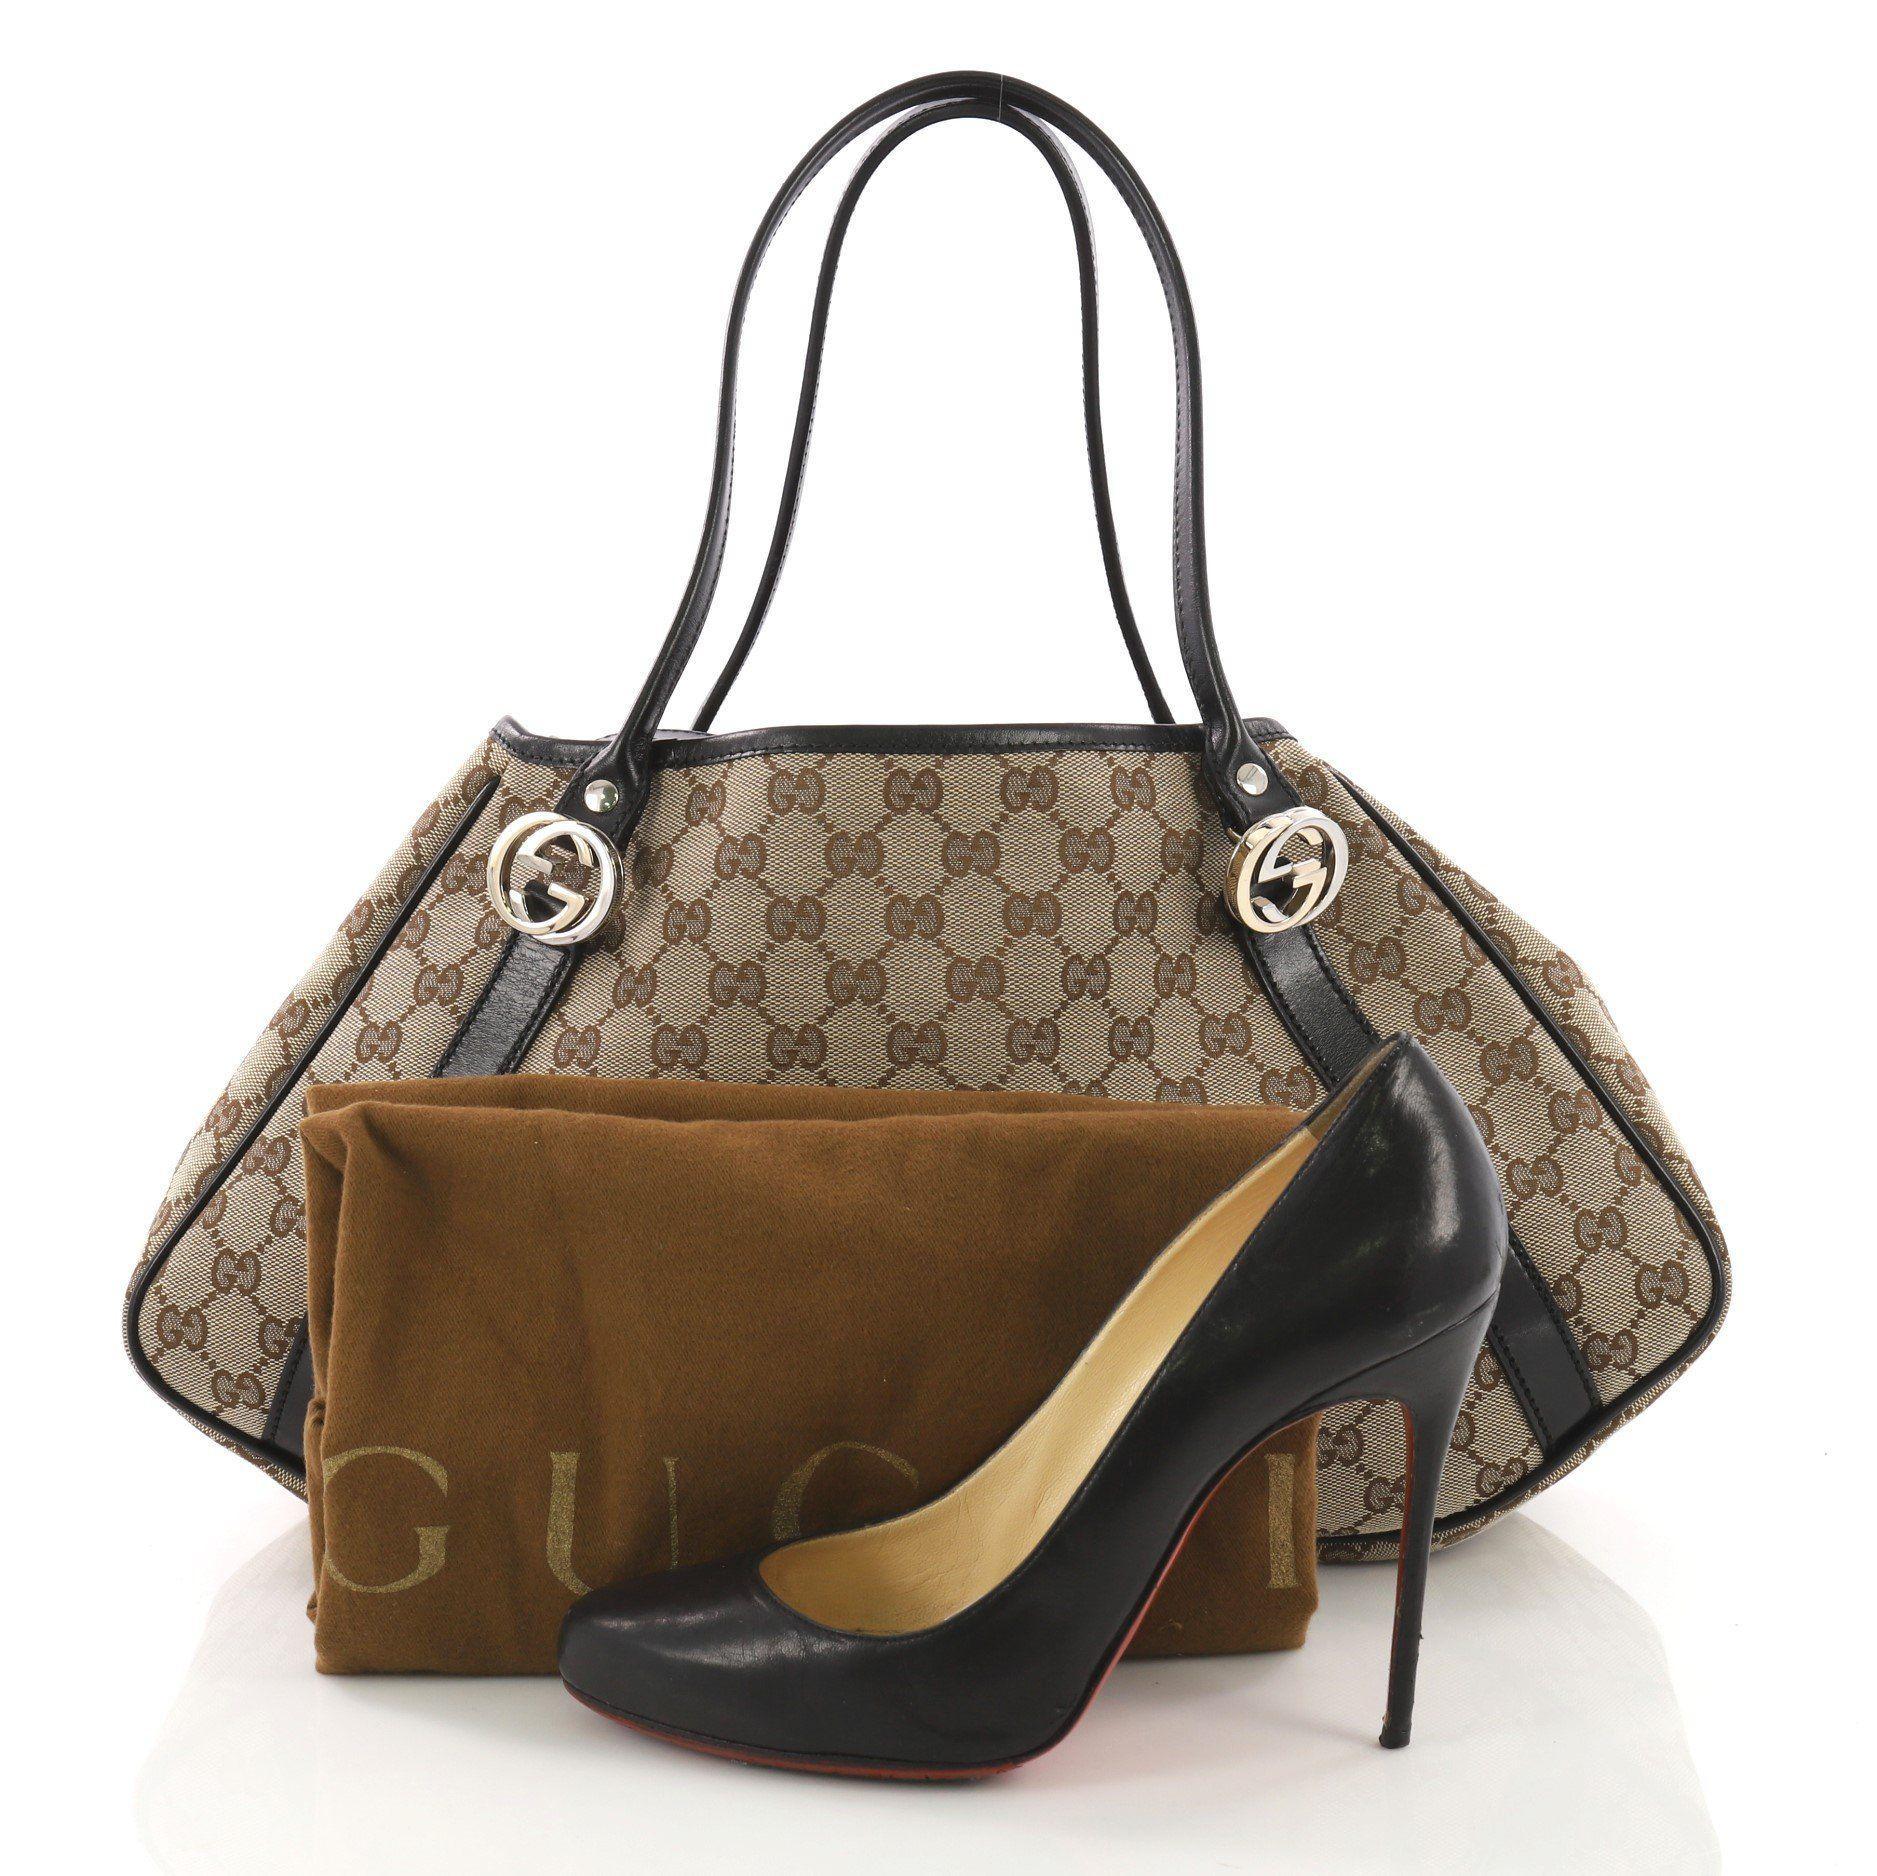 99bd03e531c Lyst - Gucci Pre Owned Twins Shoulder Bag GG Canvas Medium